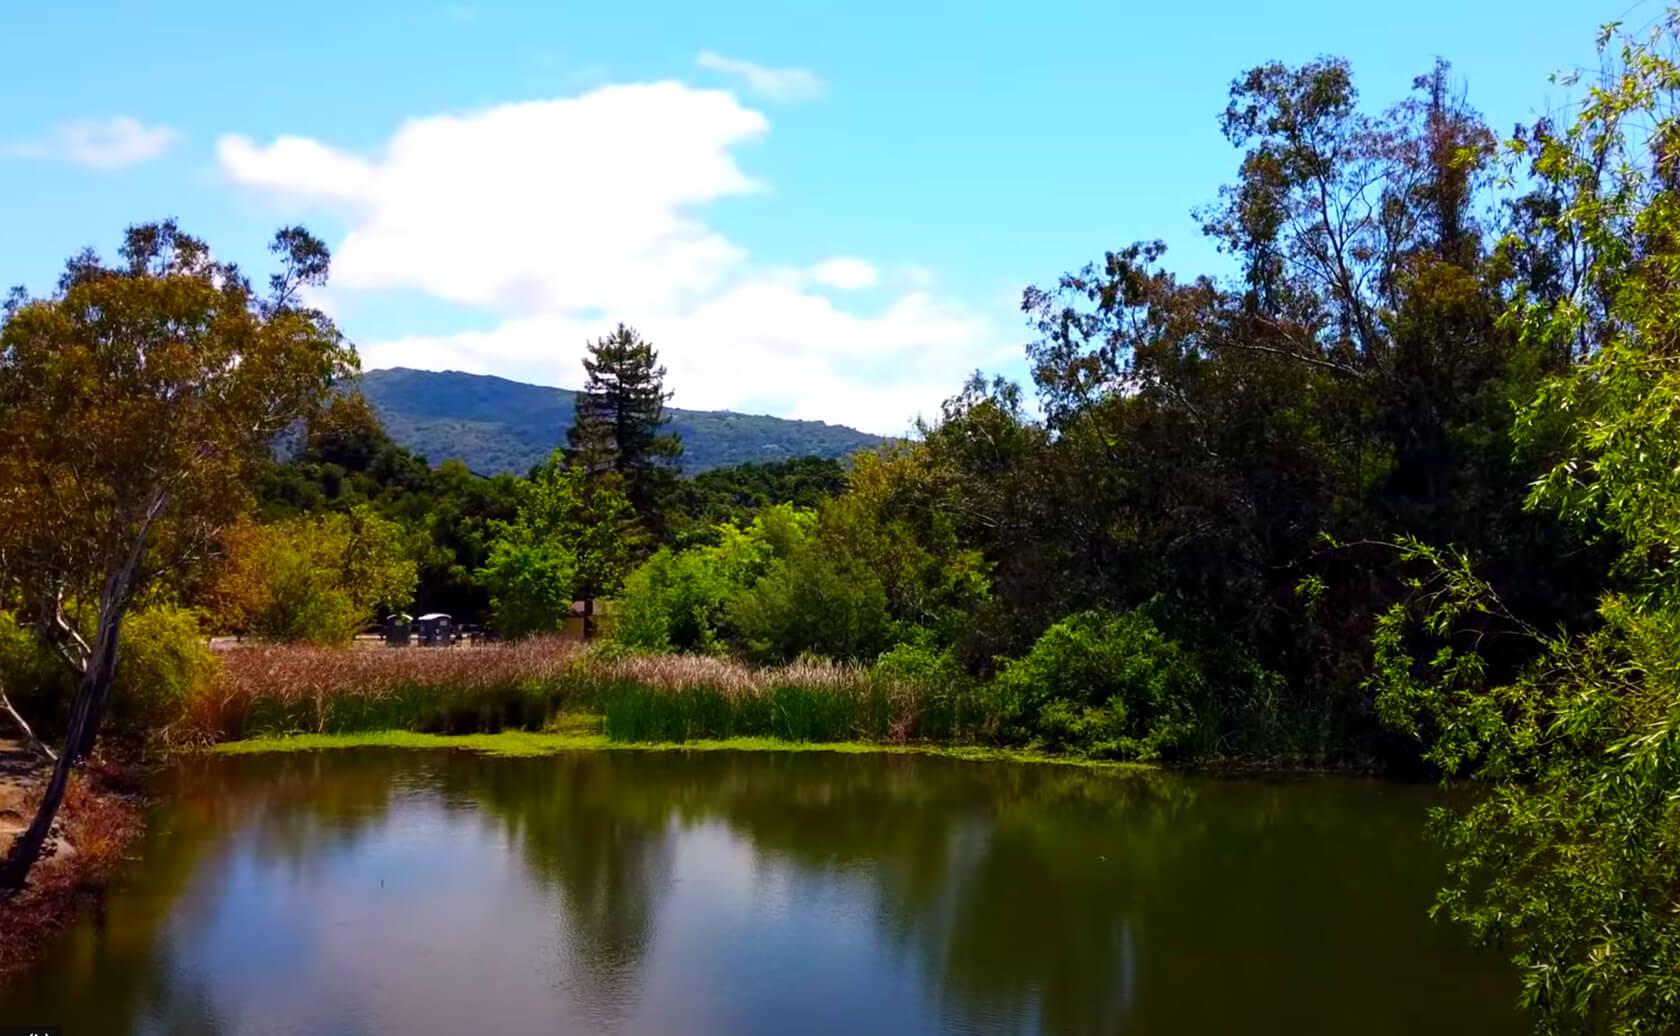 Vasona-Lake-Fishing-Guide-Report-Los-Gatos-CA-03